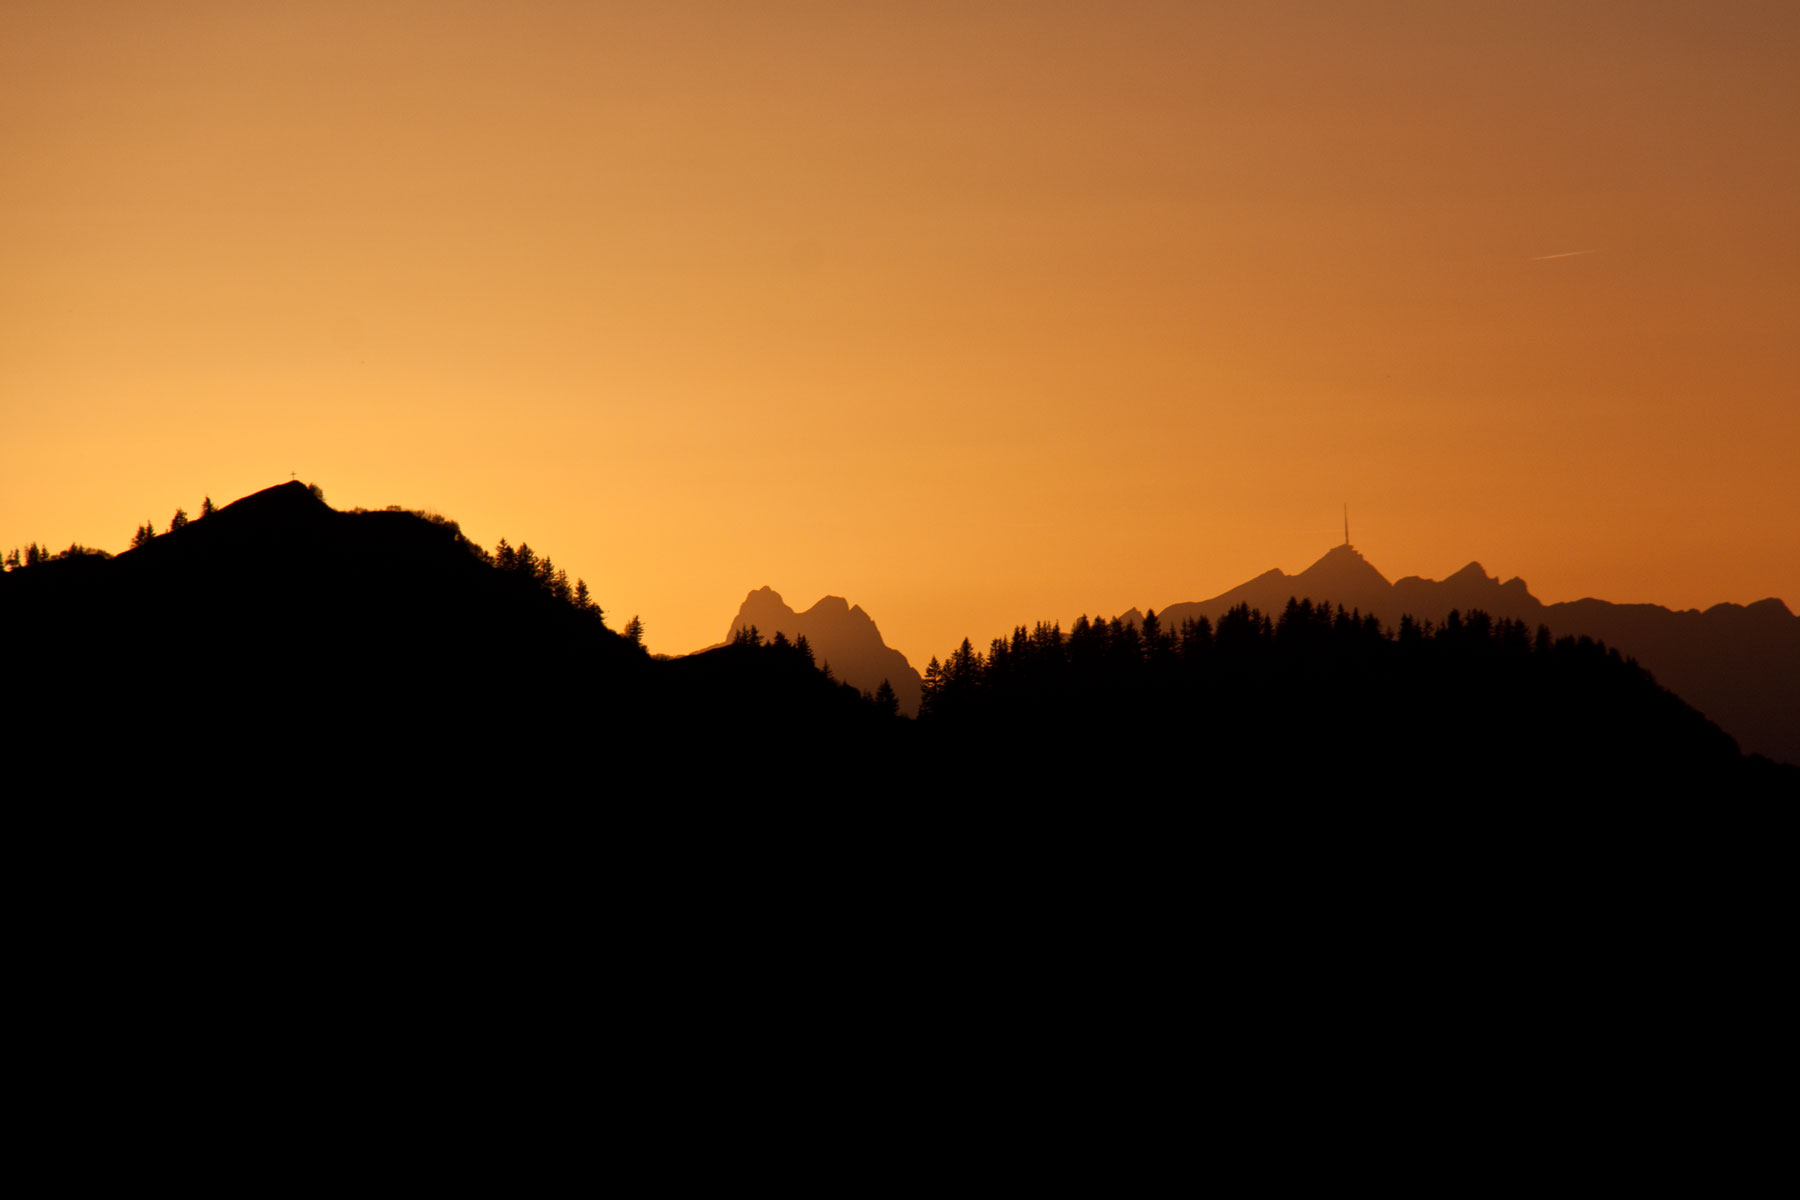 Sonnenuntergang-Schweizer Berge